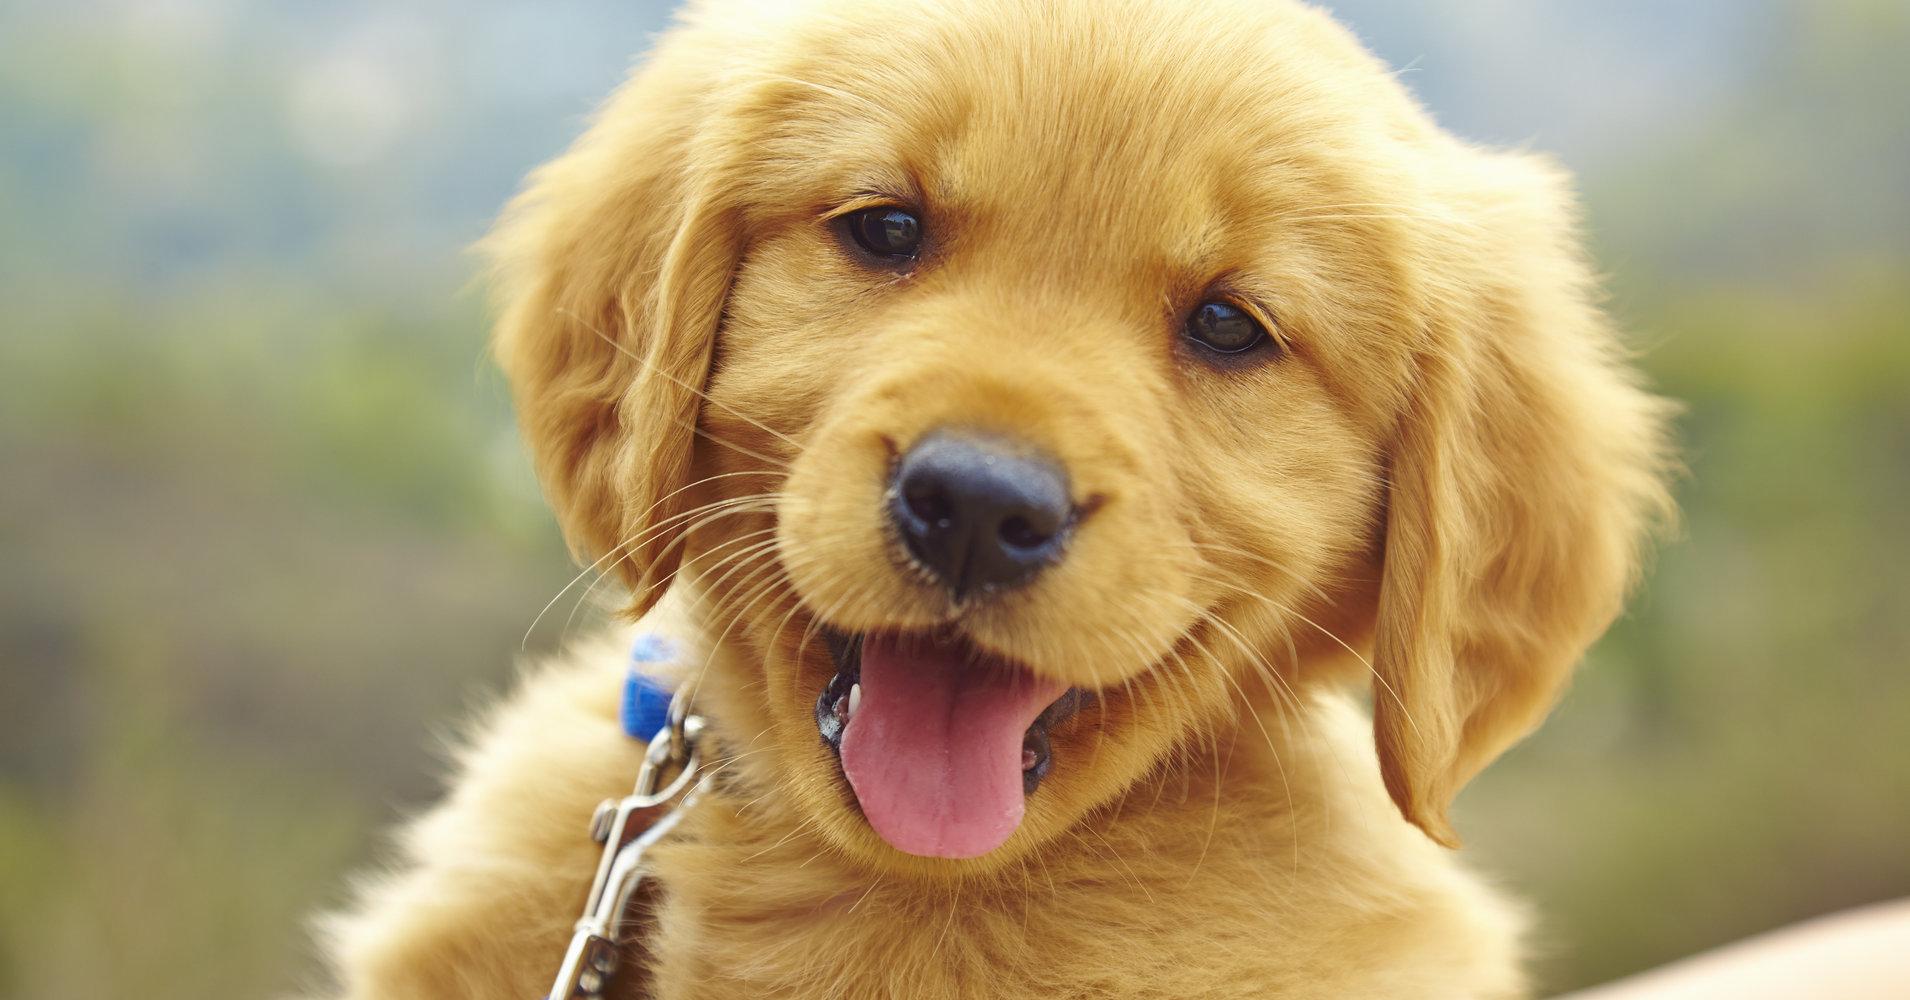 Object Oriented Programming: Dogs | Make School